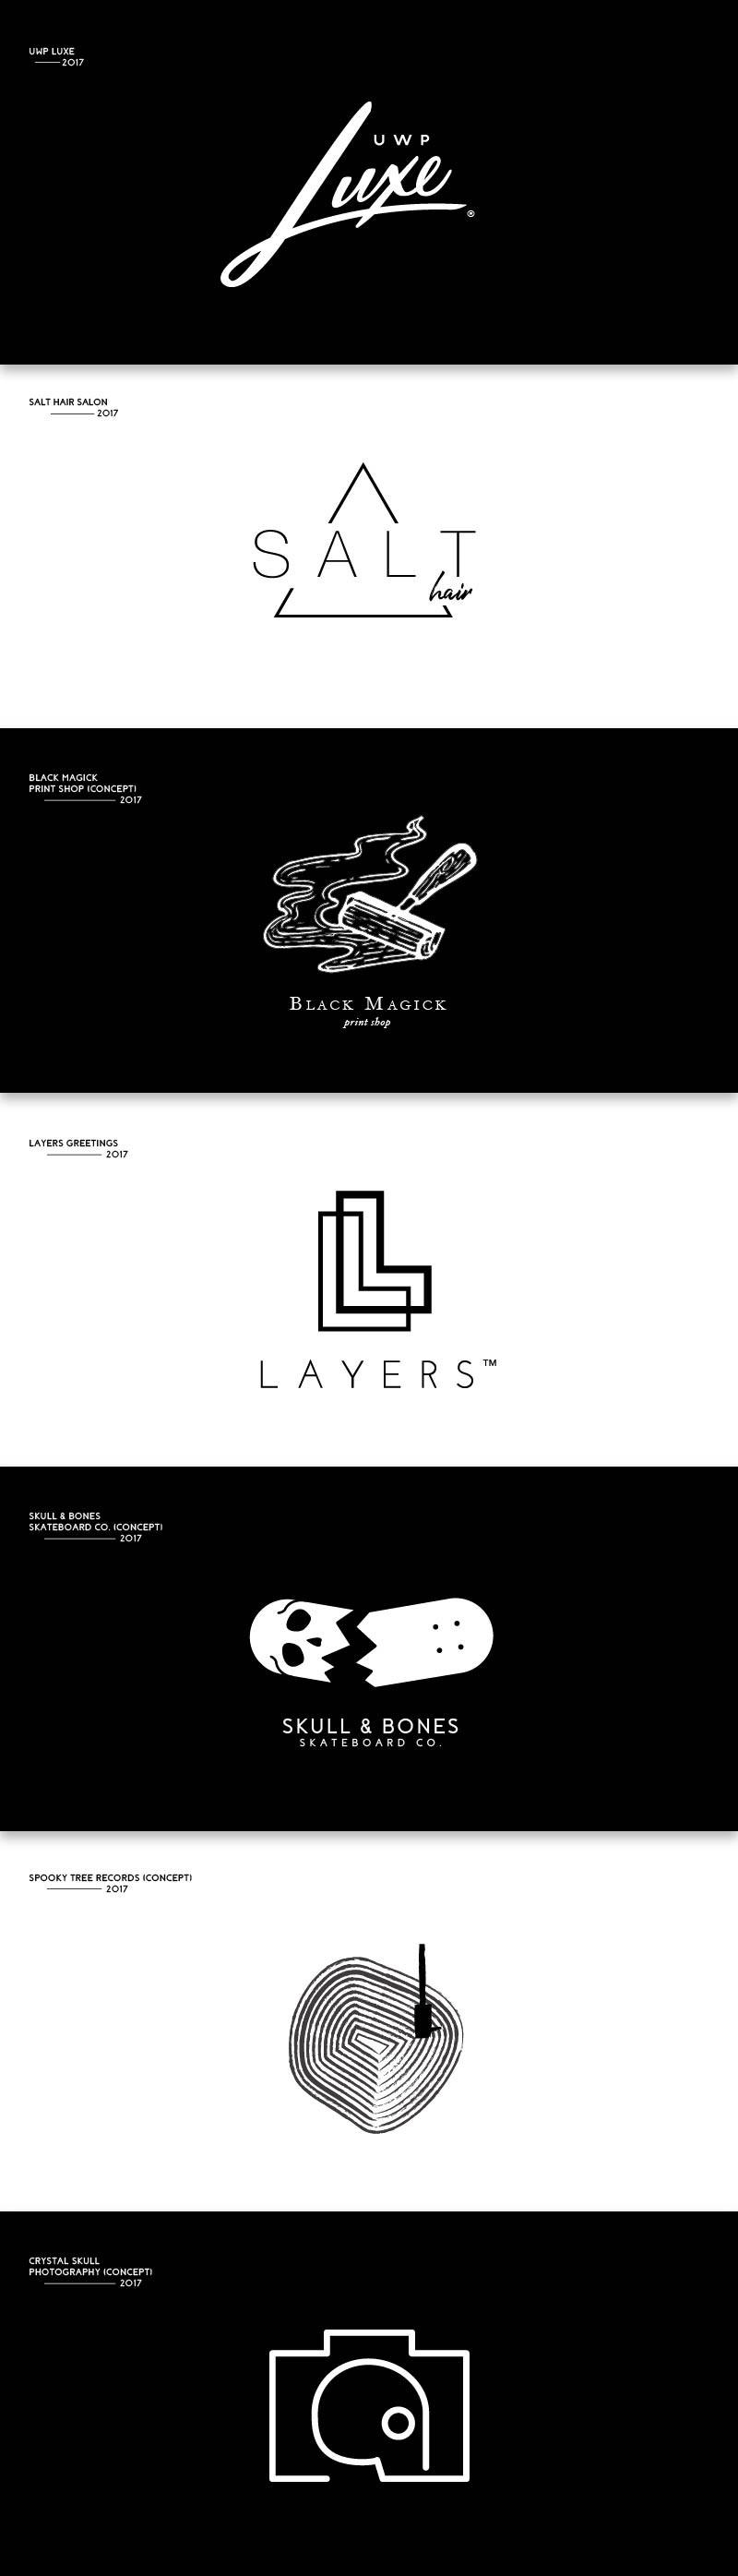 Full Size Logos